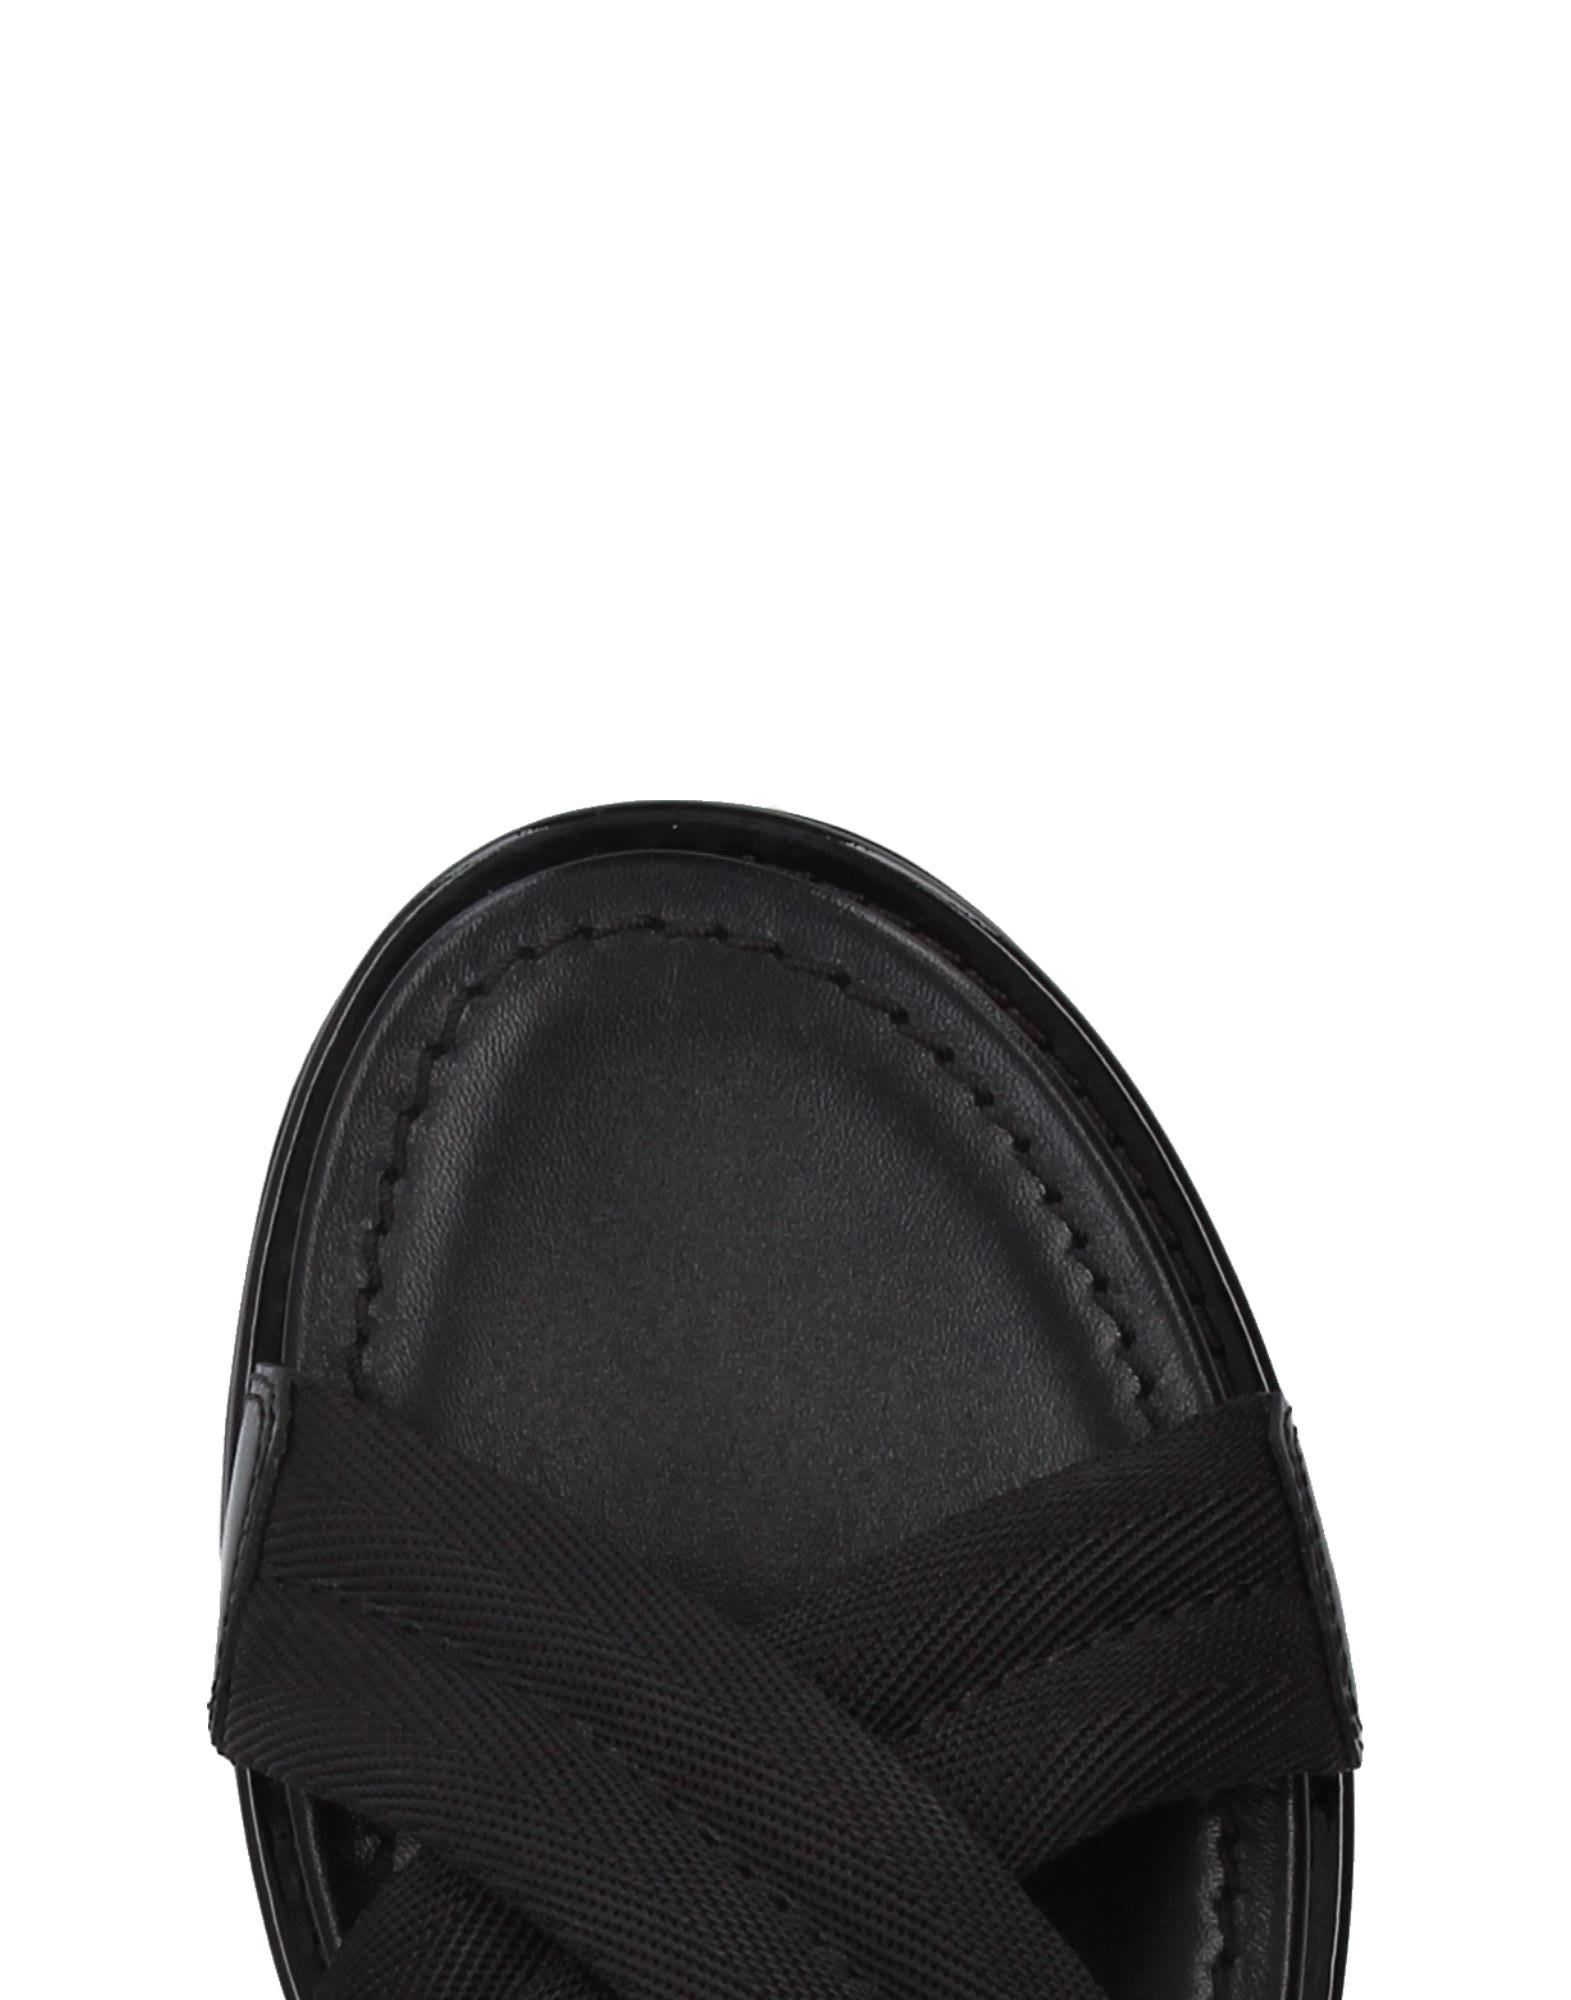 Rabatt Schuhe Prada Sport Sandalen 11379102PL Damen  11379102PL Sandalen adc0a5